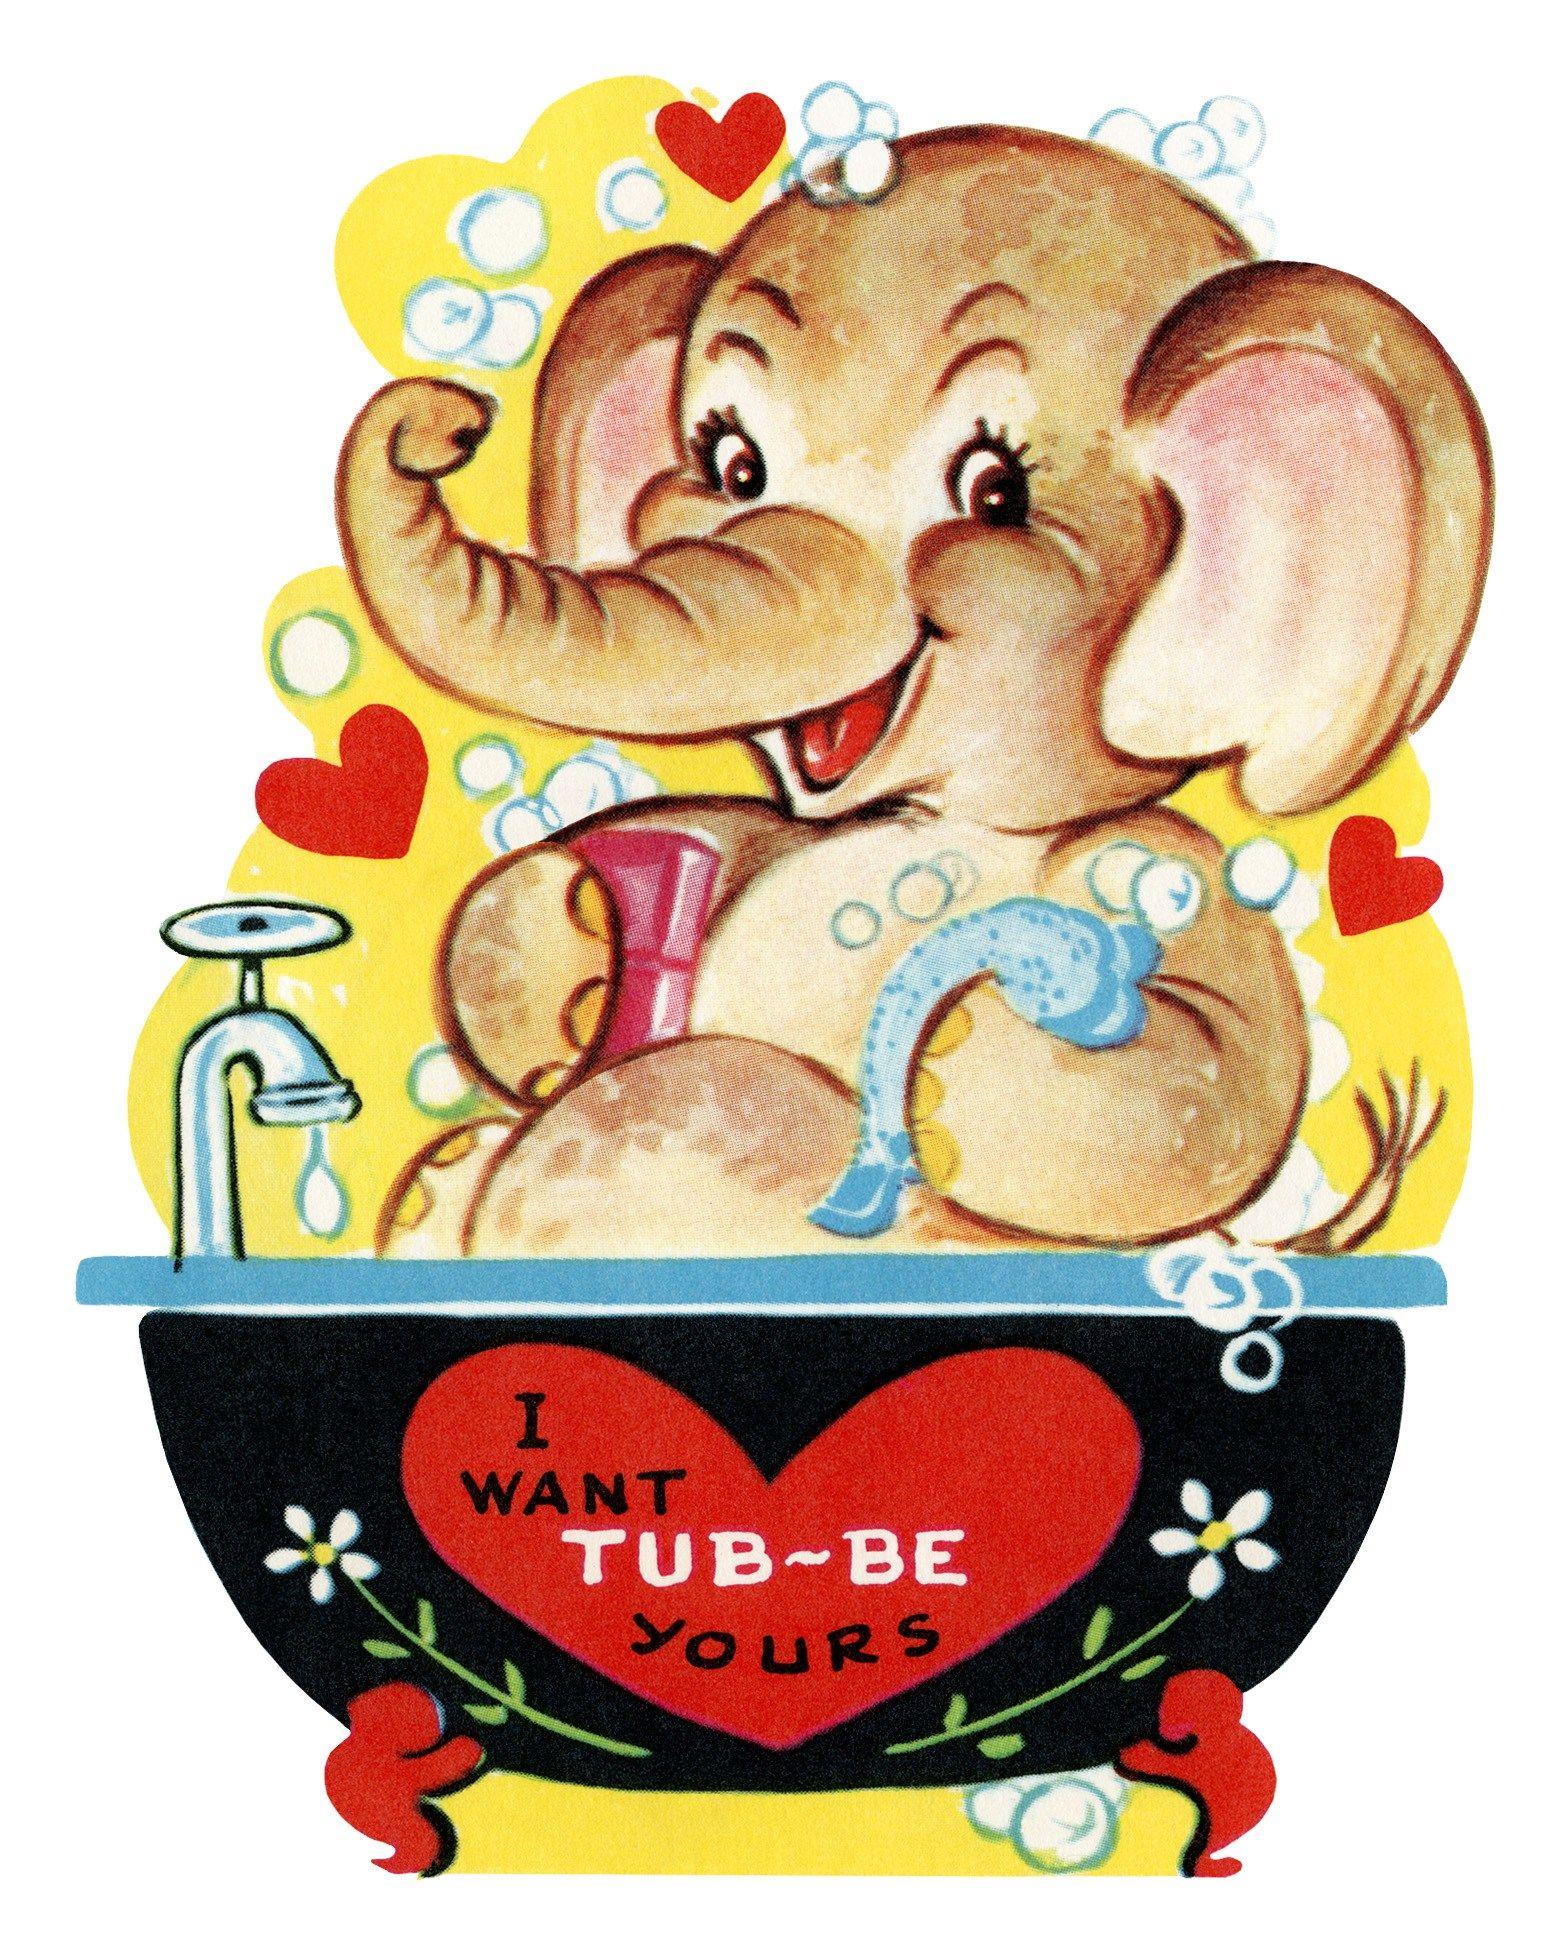 Free Printable Vintage Kids Valentine Elephant In Tub | Holidays - Free Printable Vintage Valentine Pictures